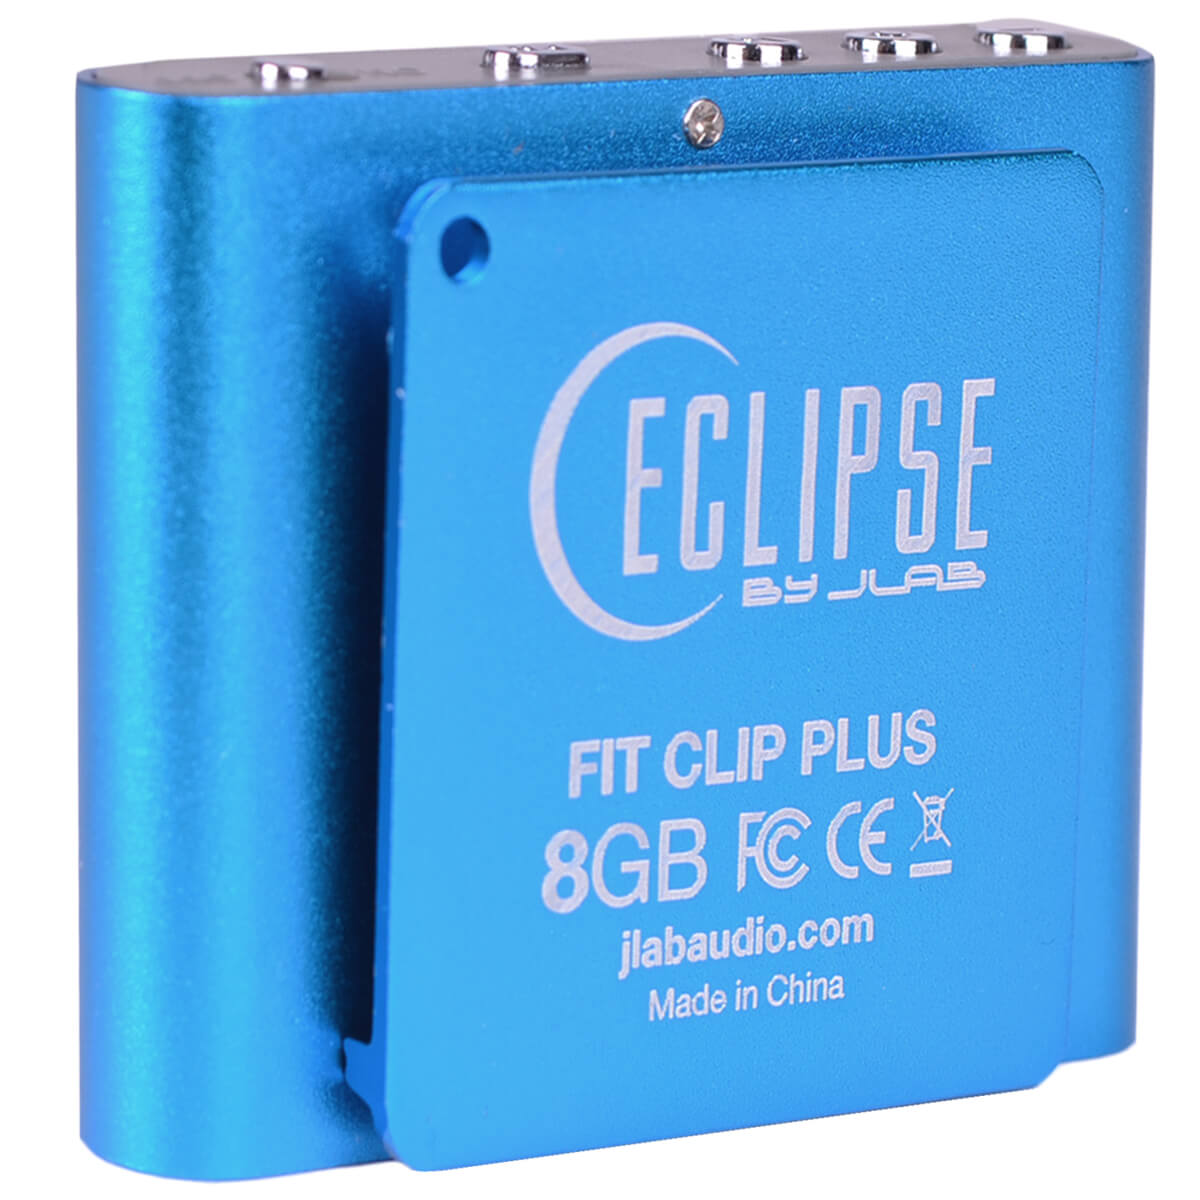 "Eclipse Fit Clip Plus 8GB 1.8/"" LCD MP3 Digital Music Video Player /& Pedometer"